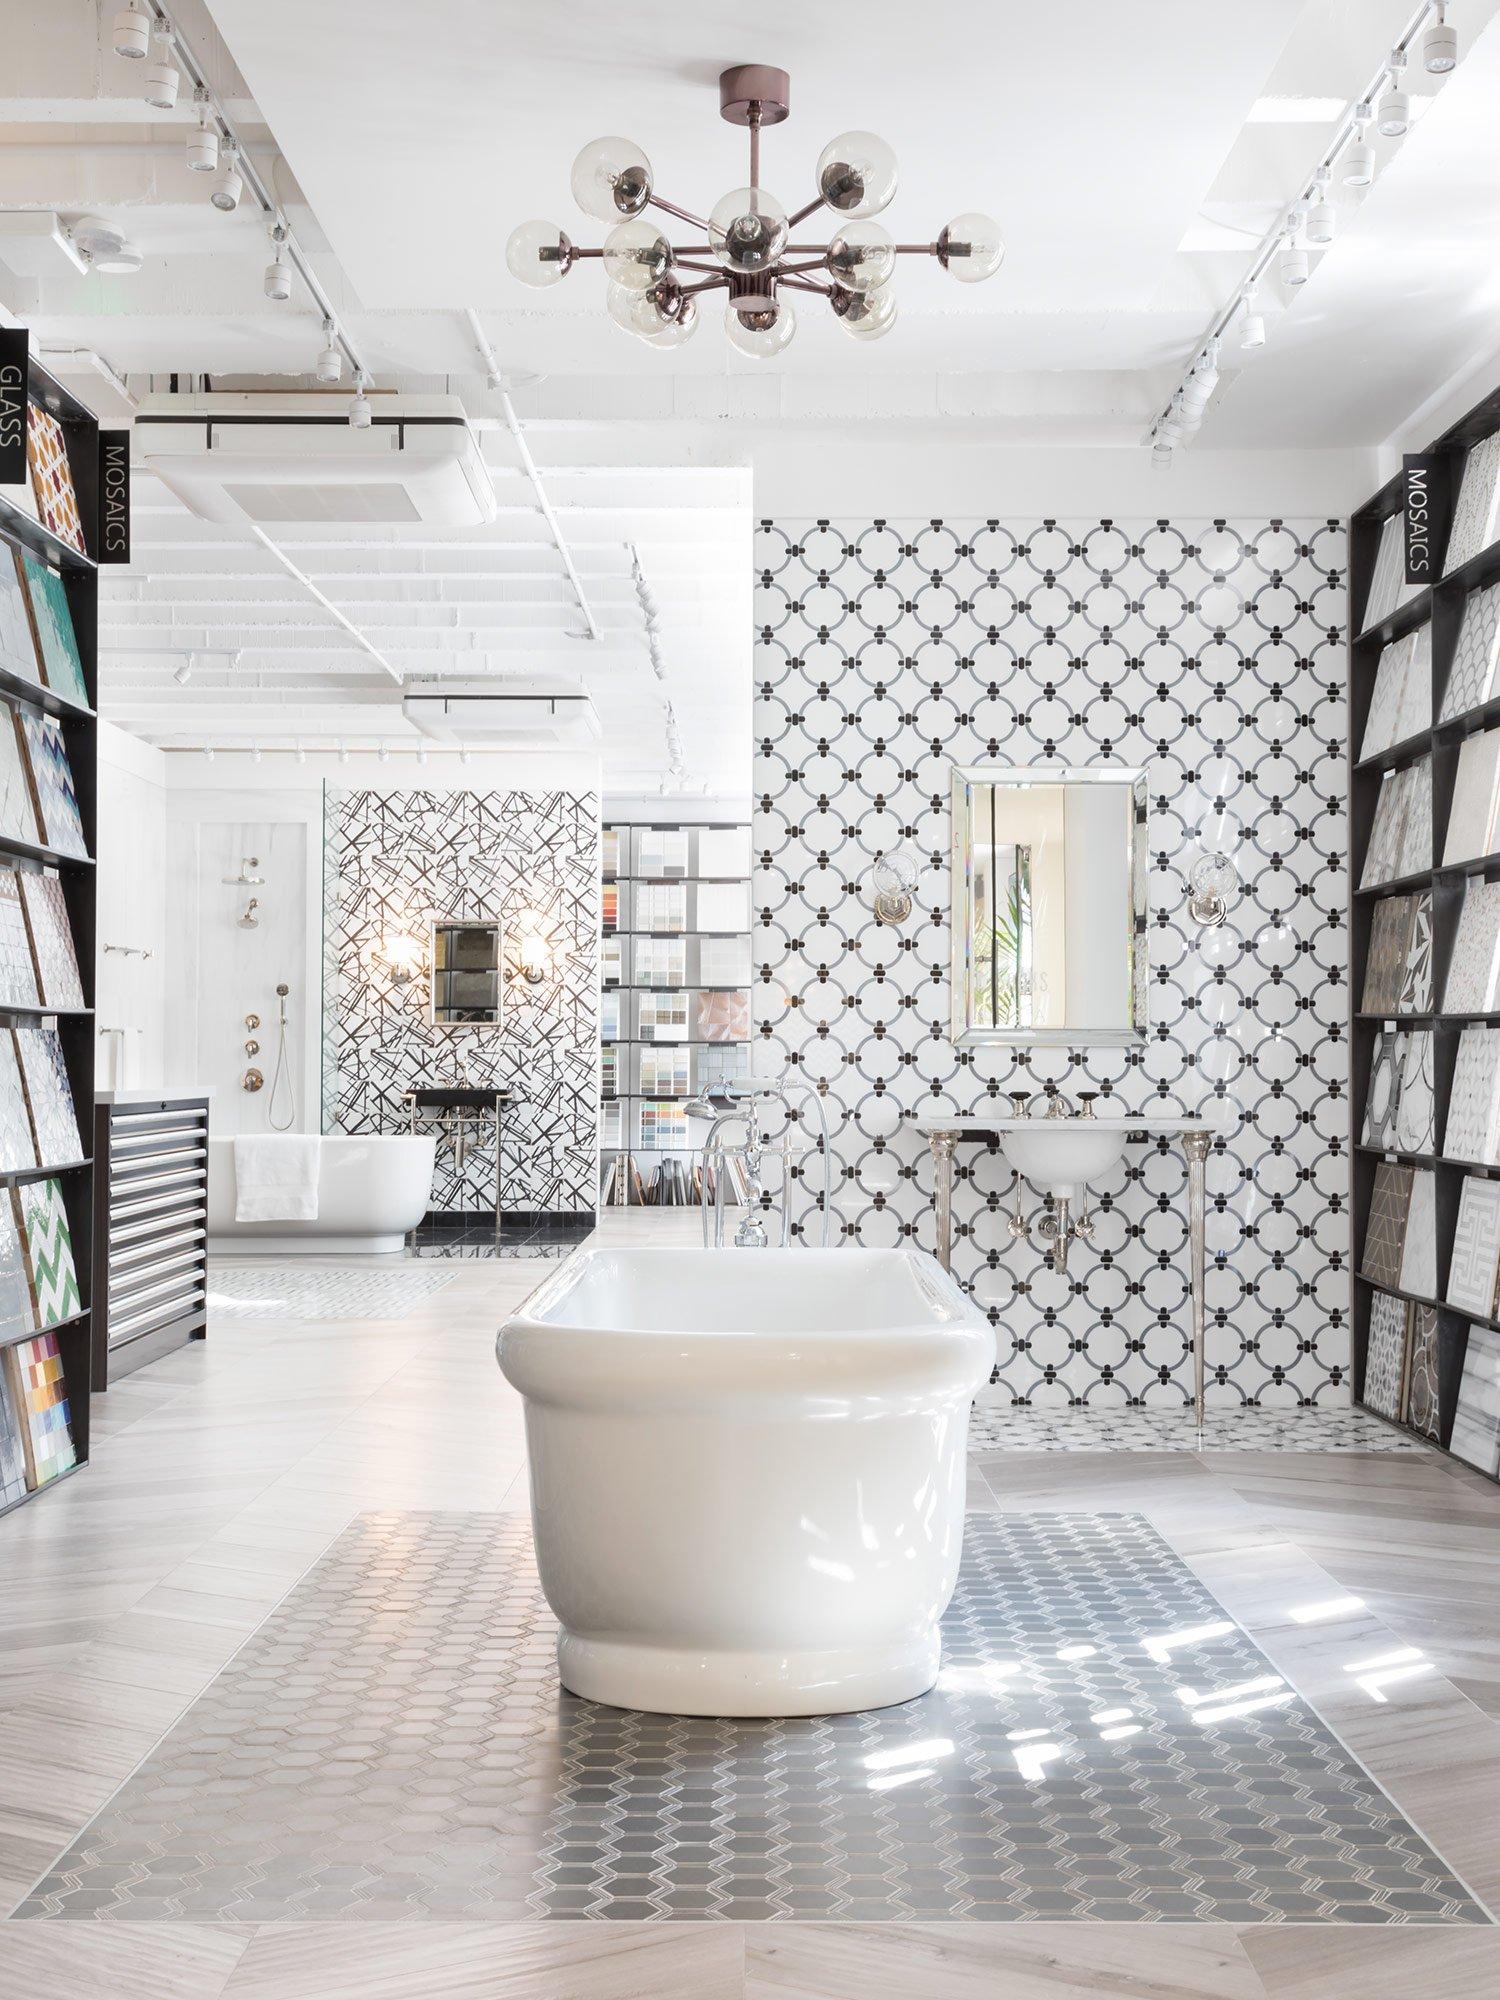 West One Bathrooms Chelsea Design Centre Showroom 2b